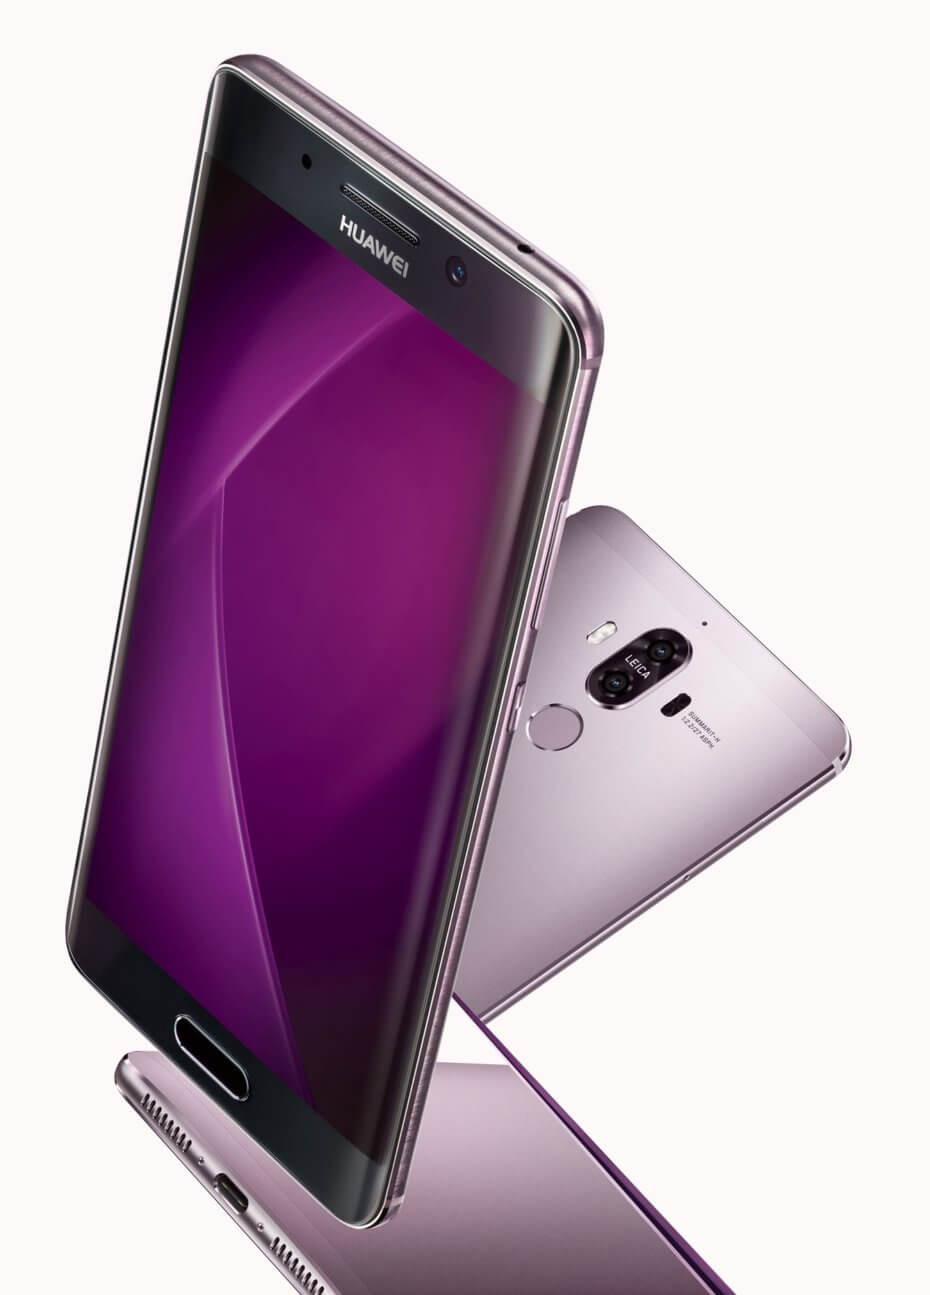 Huawei-Mate-9-Pro (1)